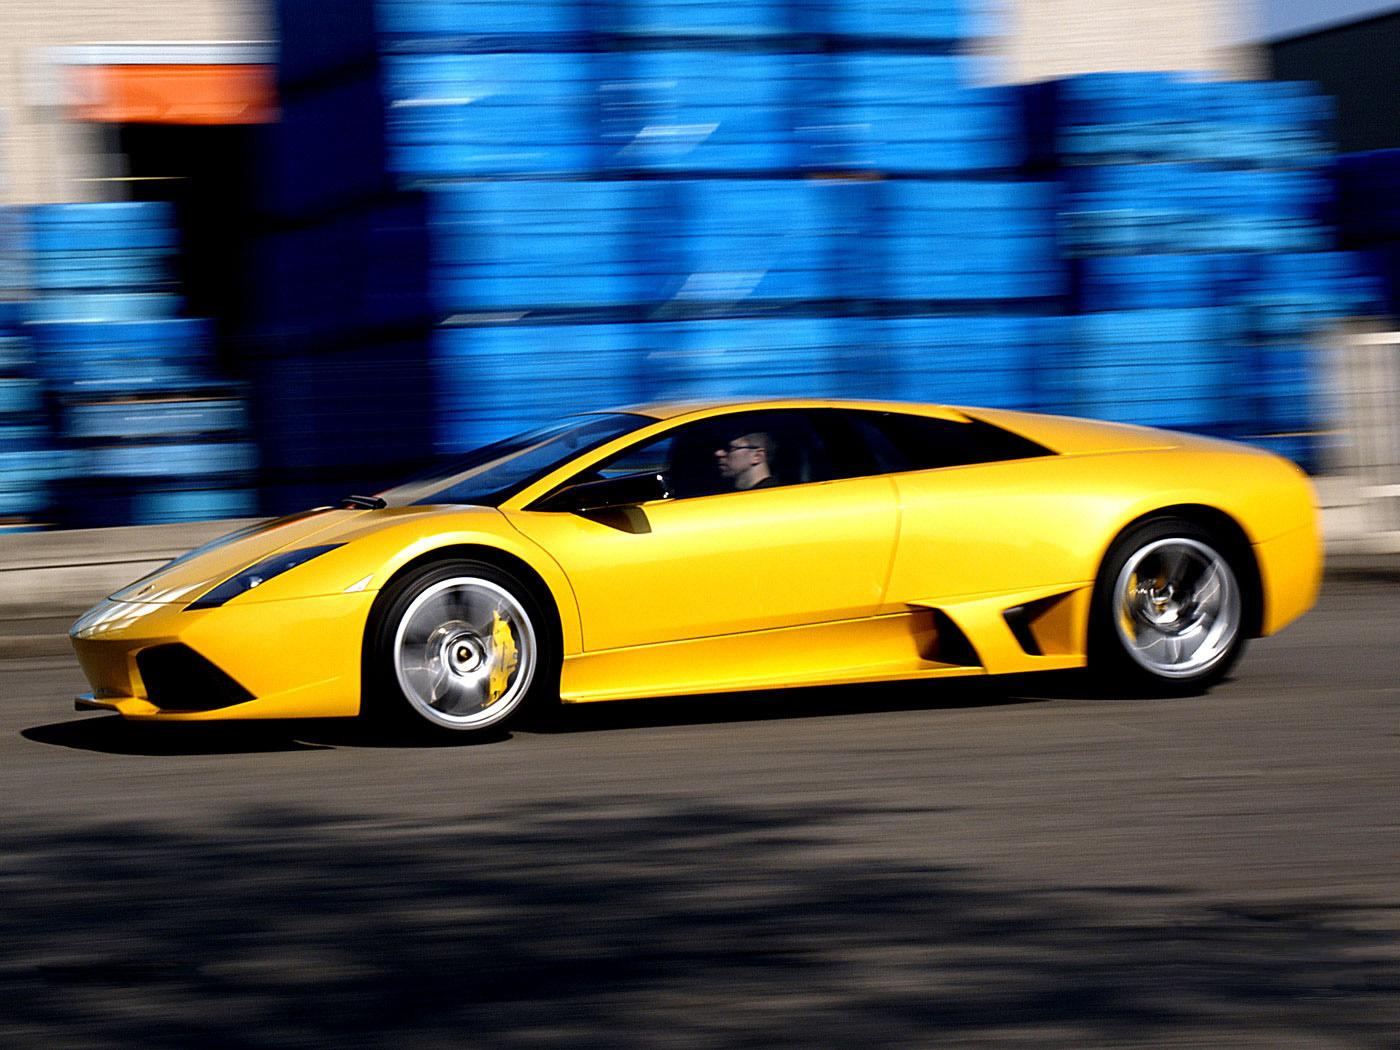 Lamborghini Murcielago LP640 picture # 35880 : Lamborghini photo ...